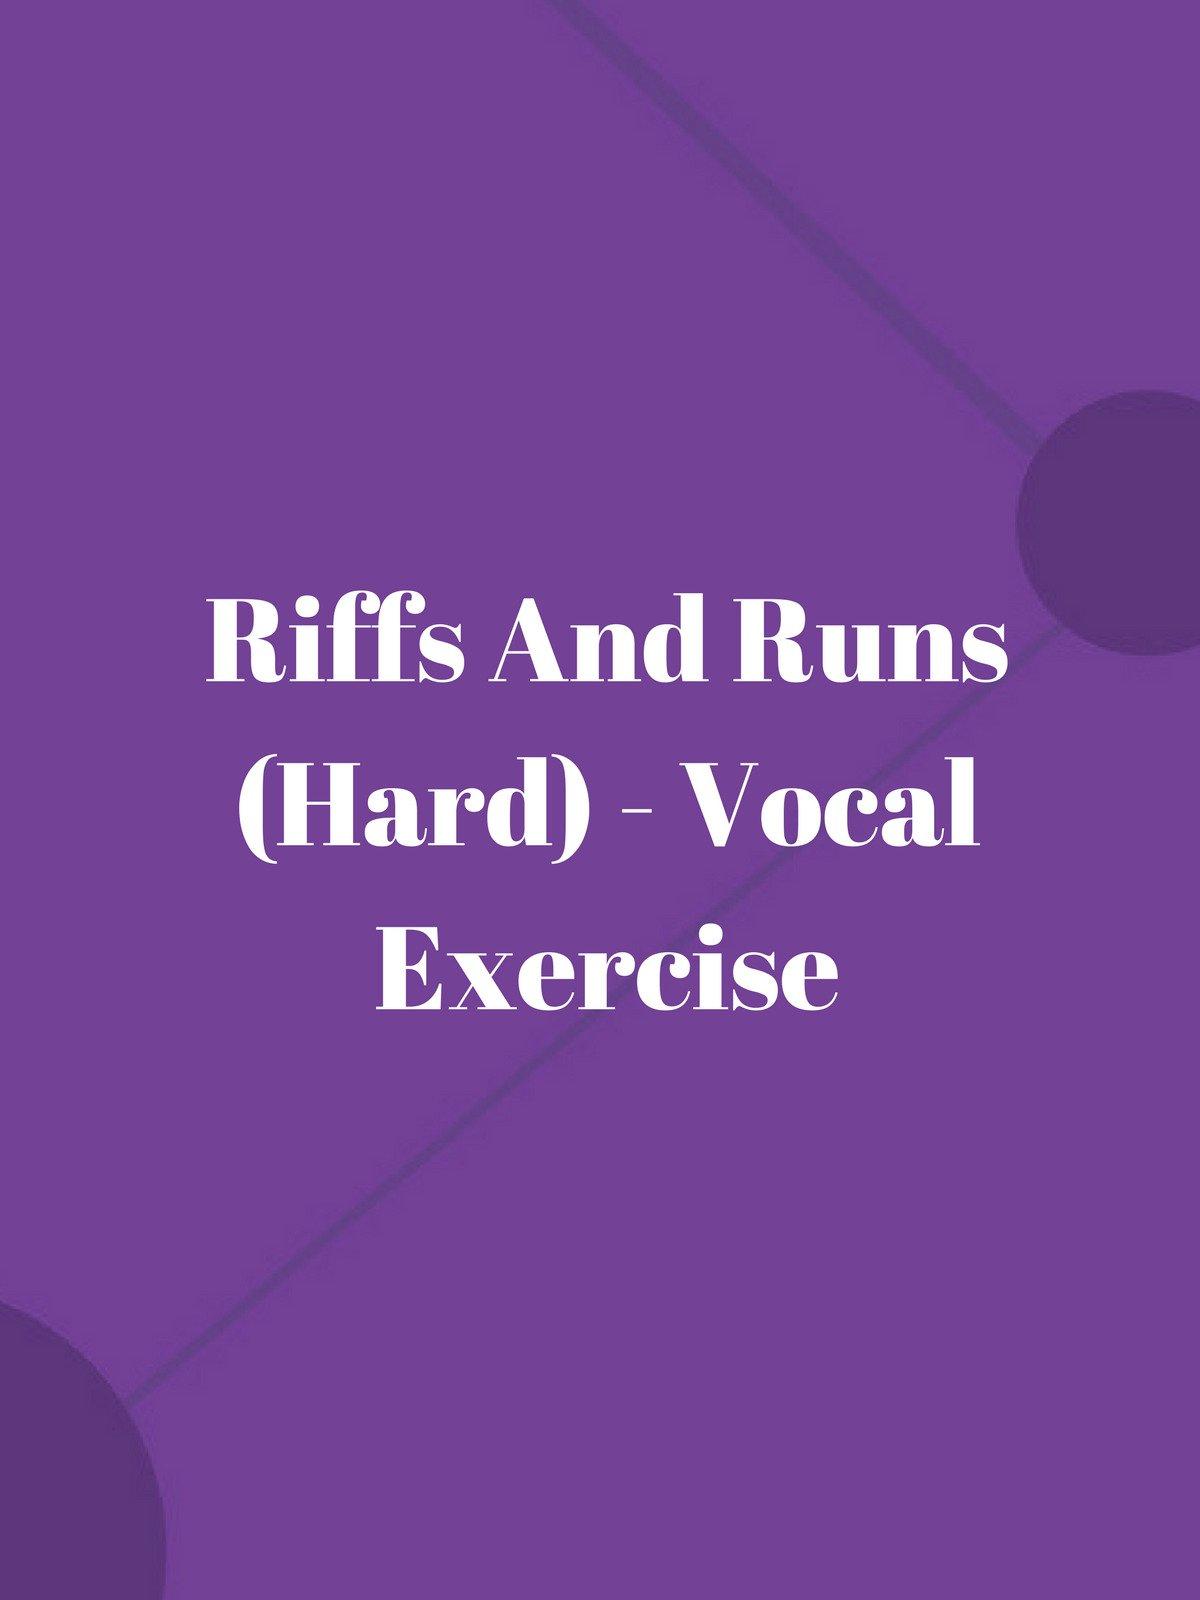 Riffs And Runs (Hard)